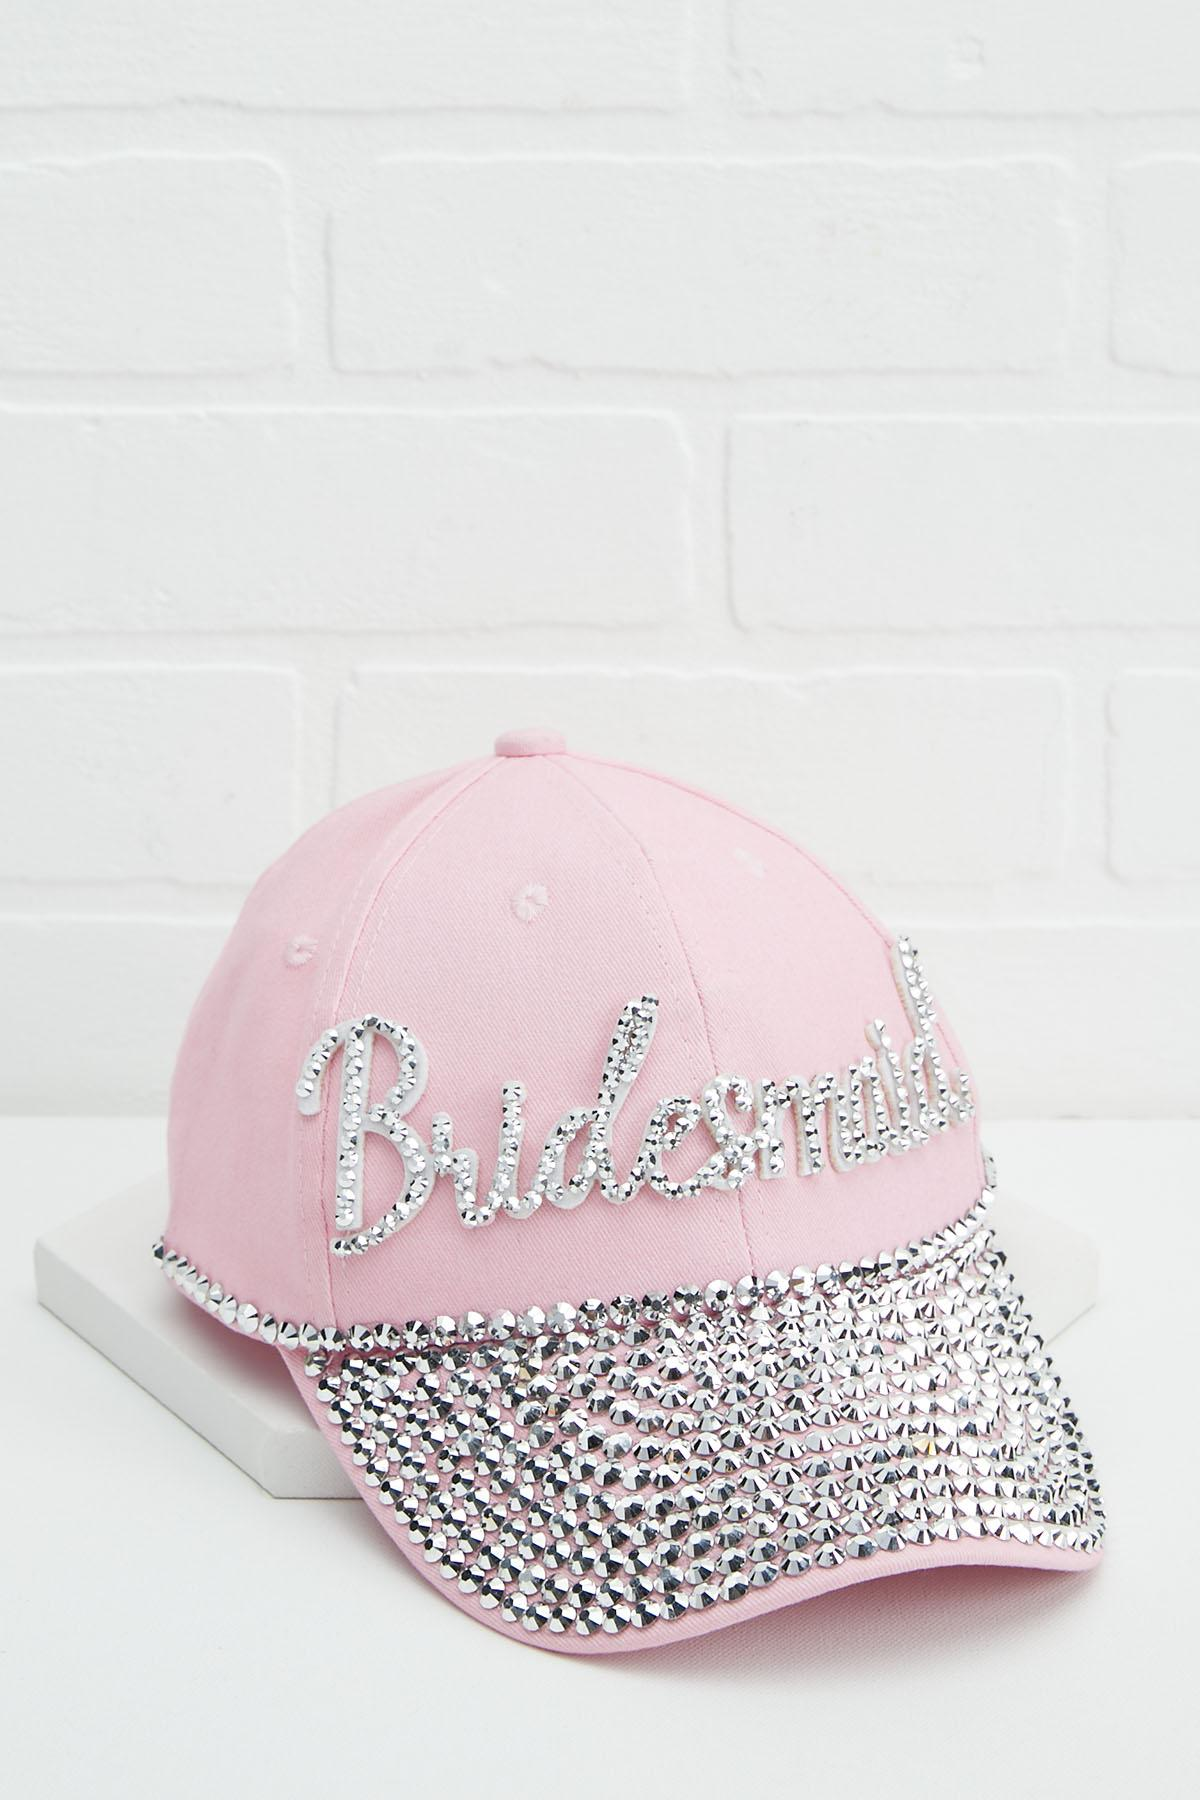 Blingy Bridesmaid Hat